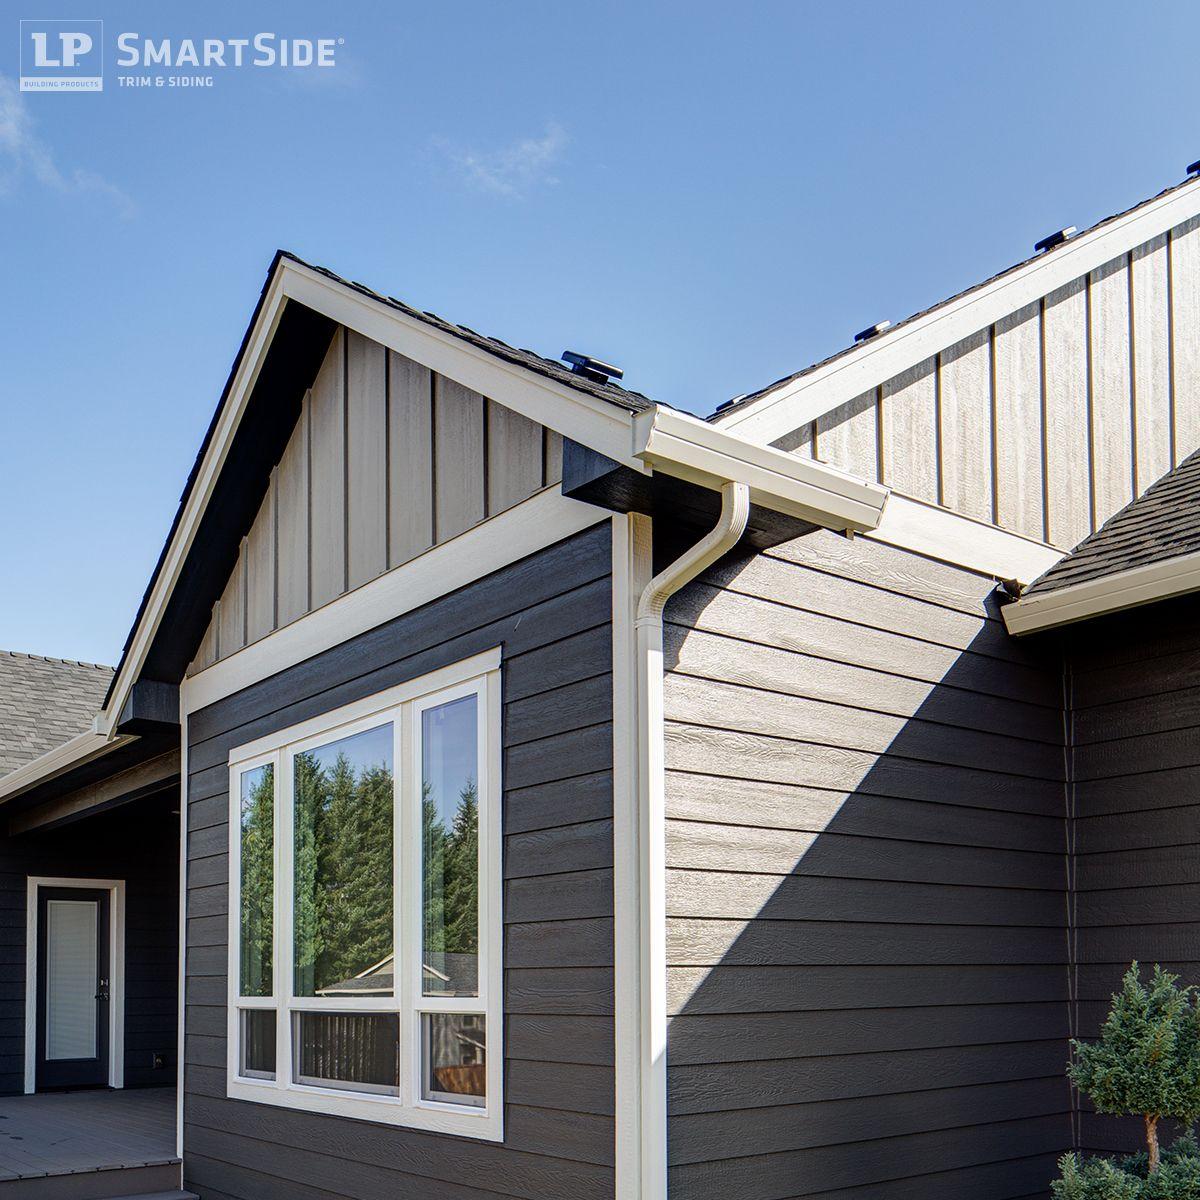 Lp Smartside Siding Extreme Impact Testing Exterior Siding Exterior Siding Options Exterior Renovation